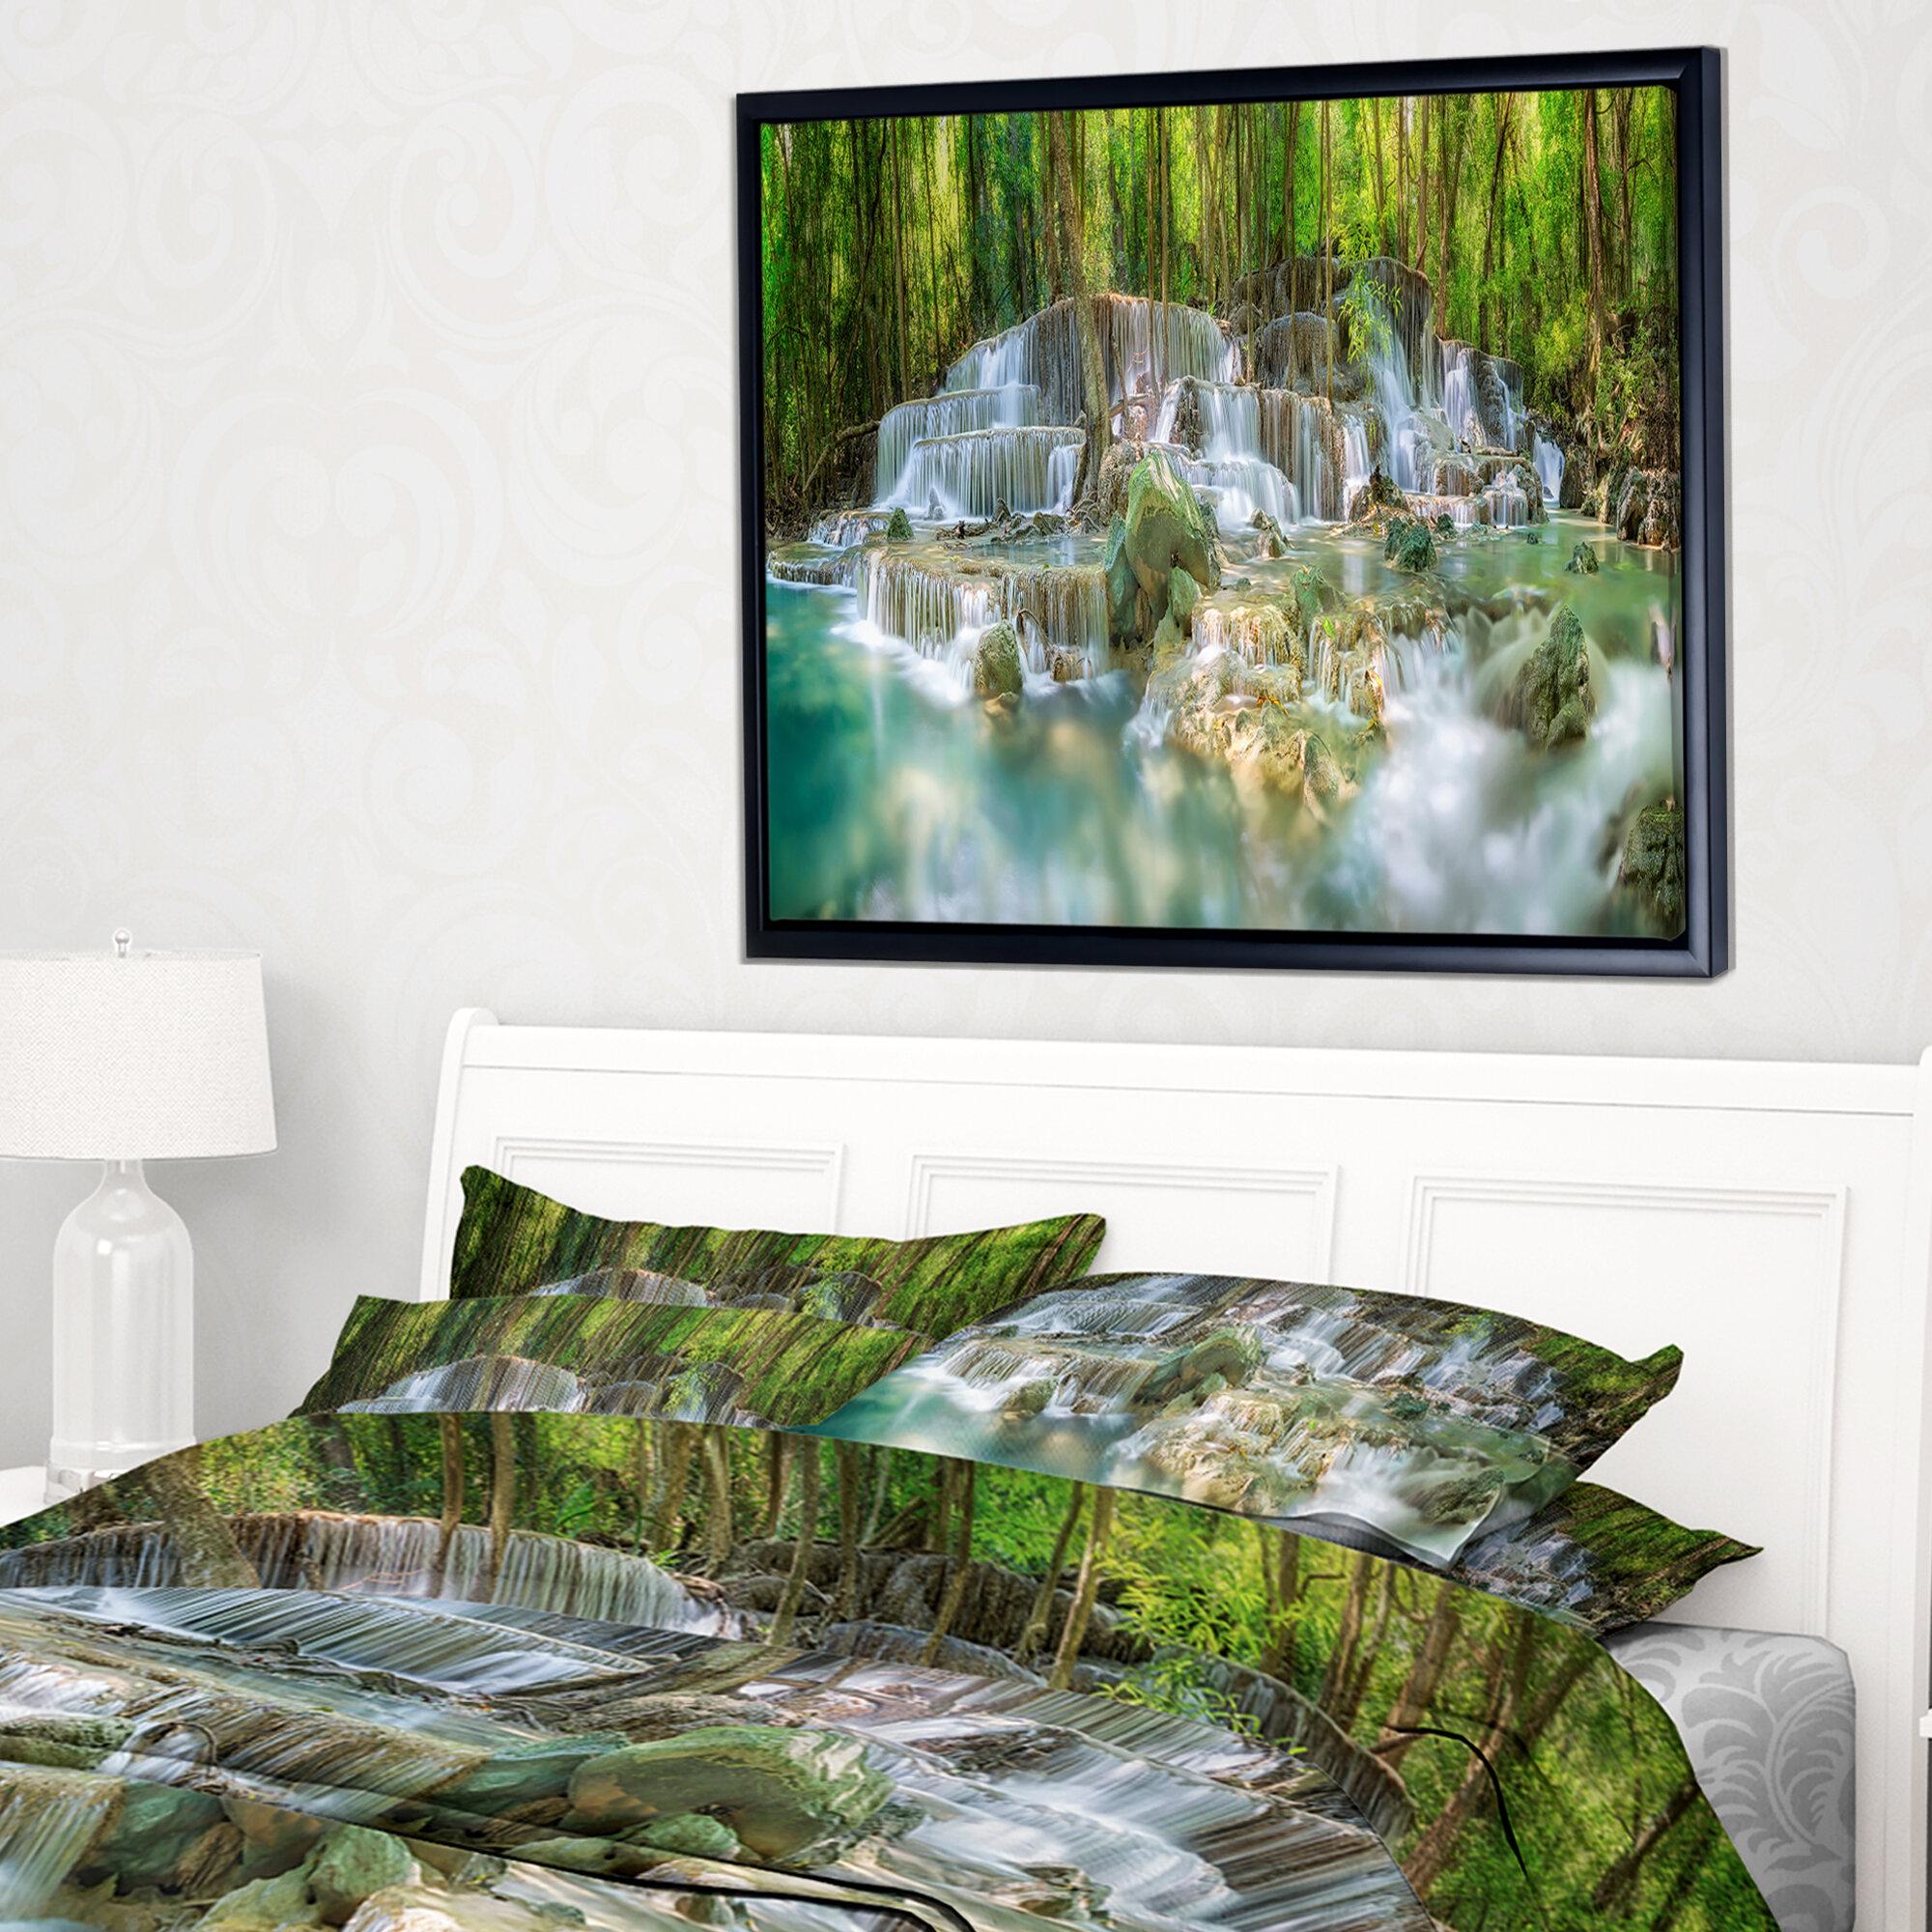 East Urban Home Level 6 Of Huaimaekamin Waterfall Framed Graphic Art Print On Wrapped Canvas Wayfair